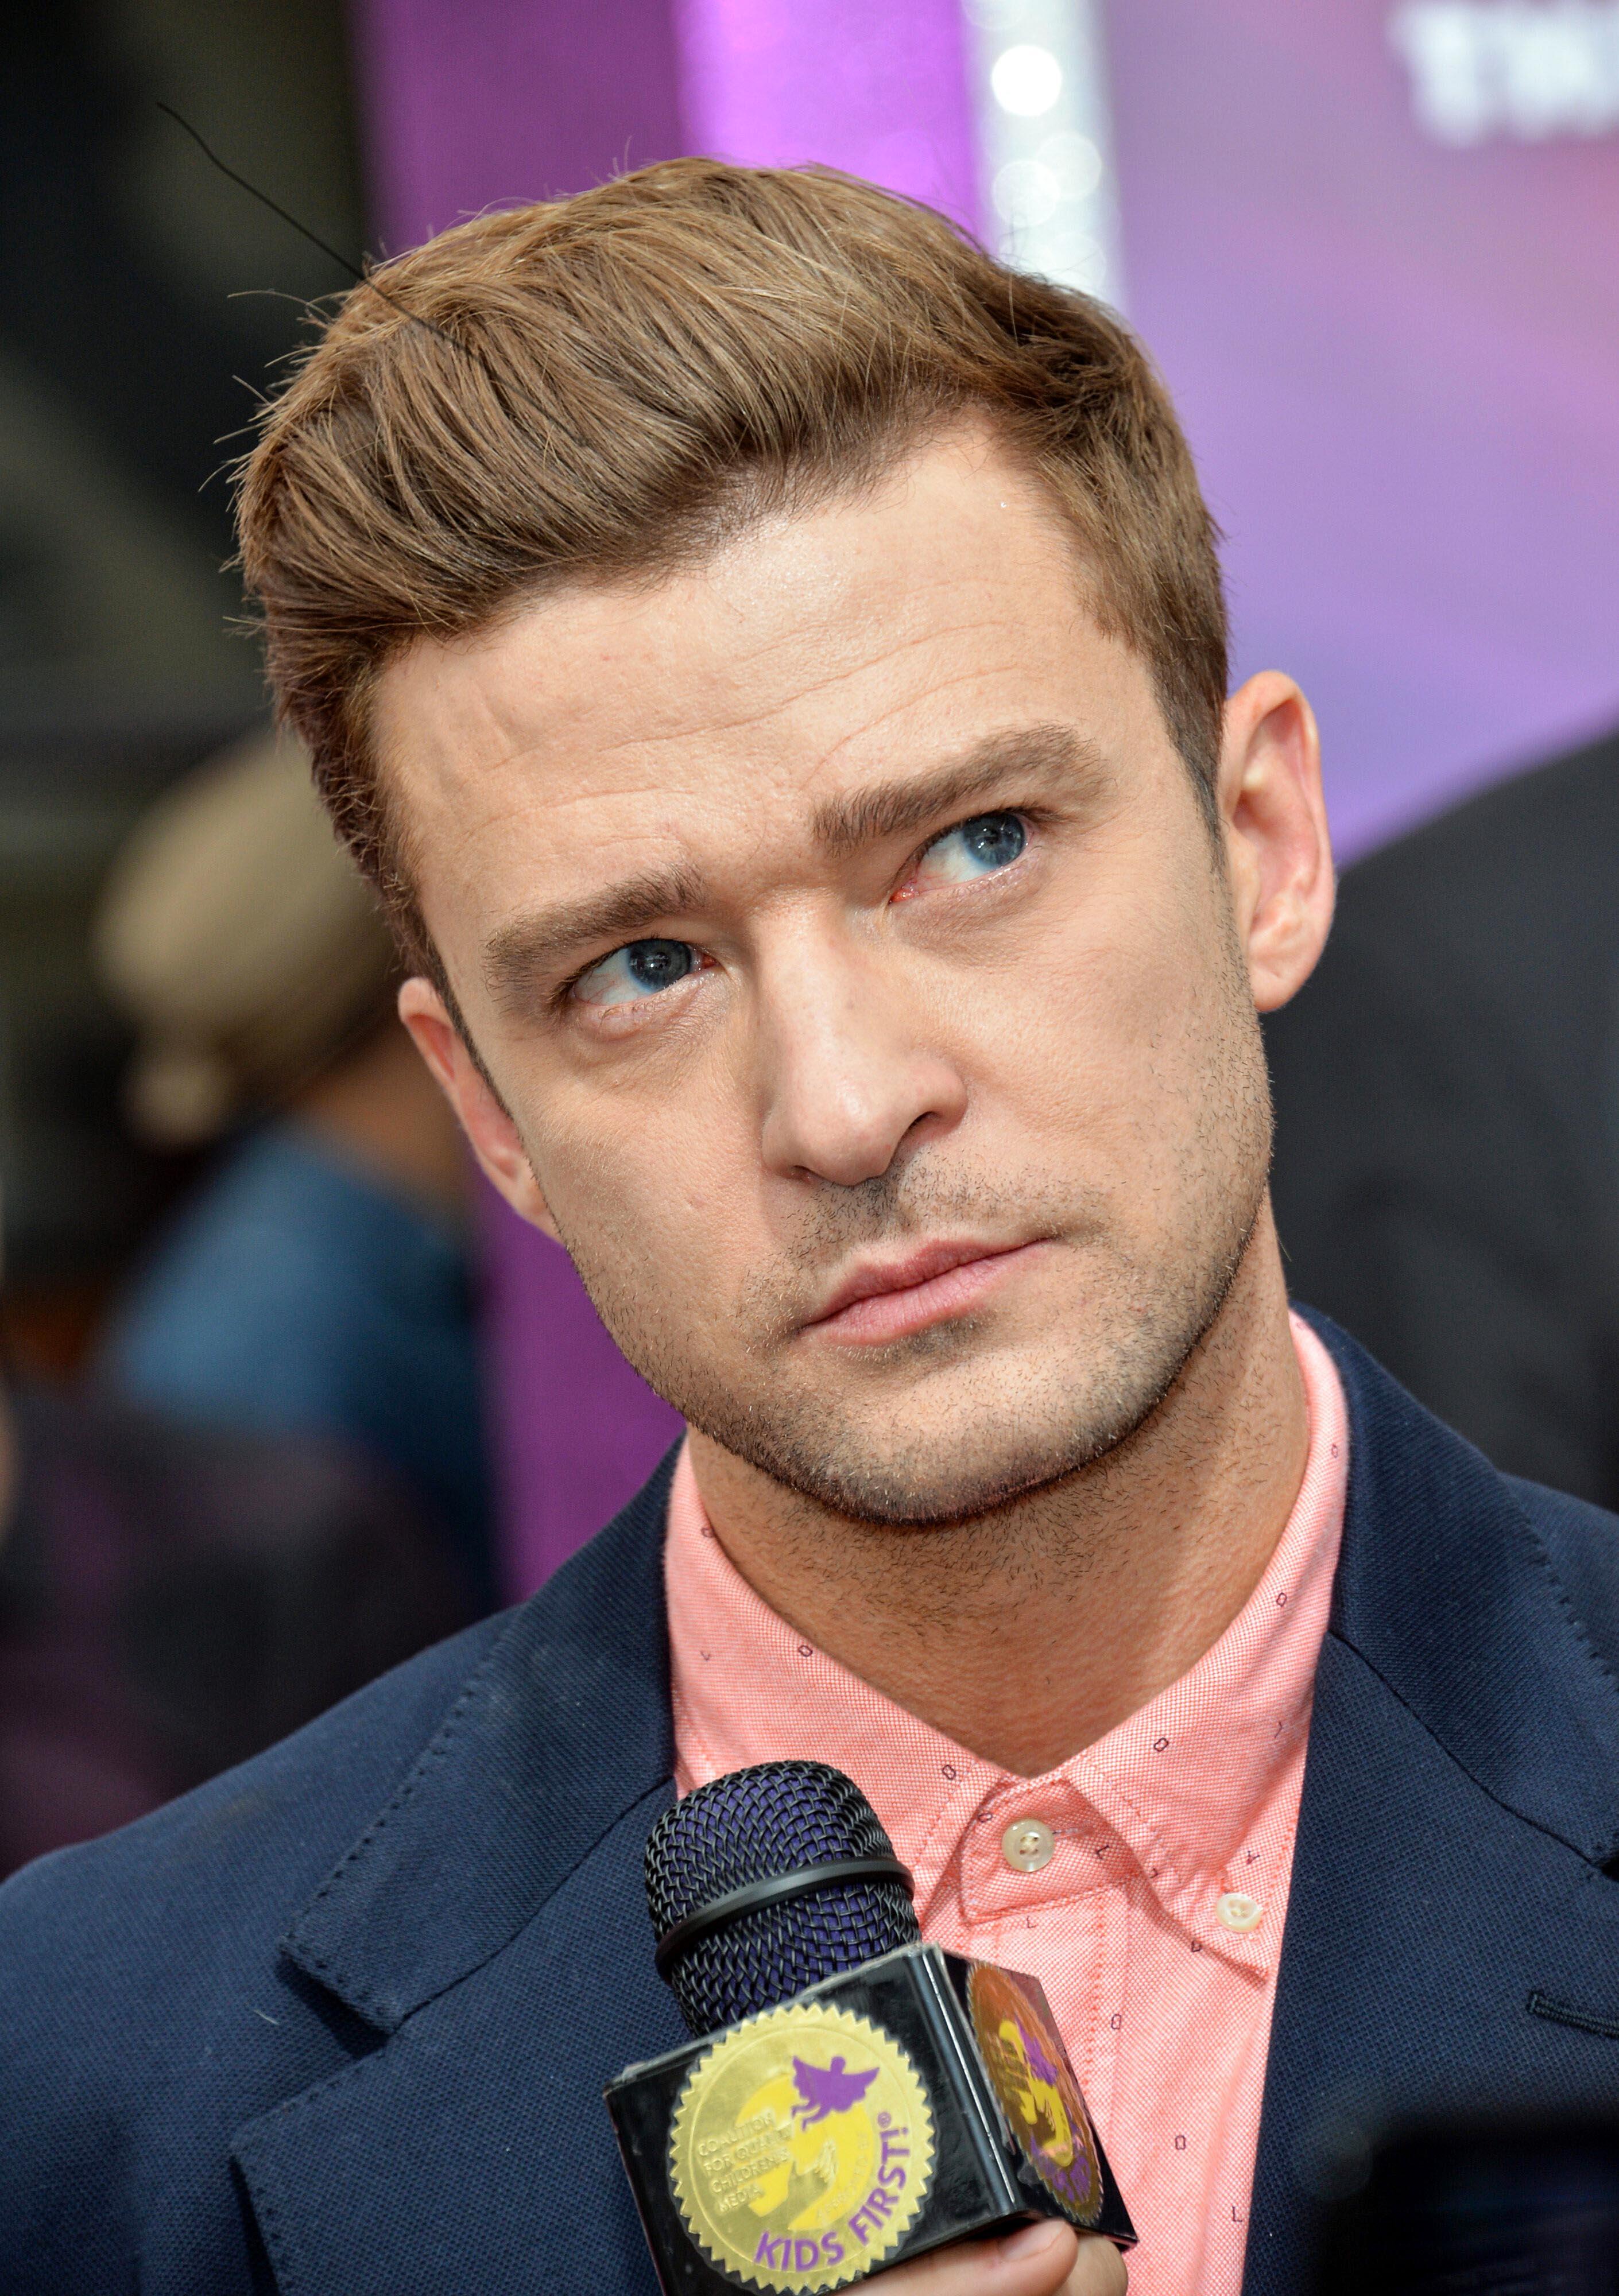 Justin Timberlake's Short Back and Sides